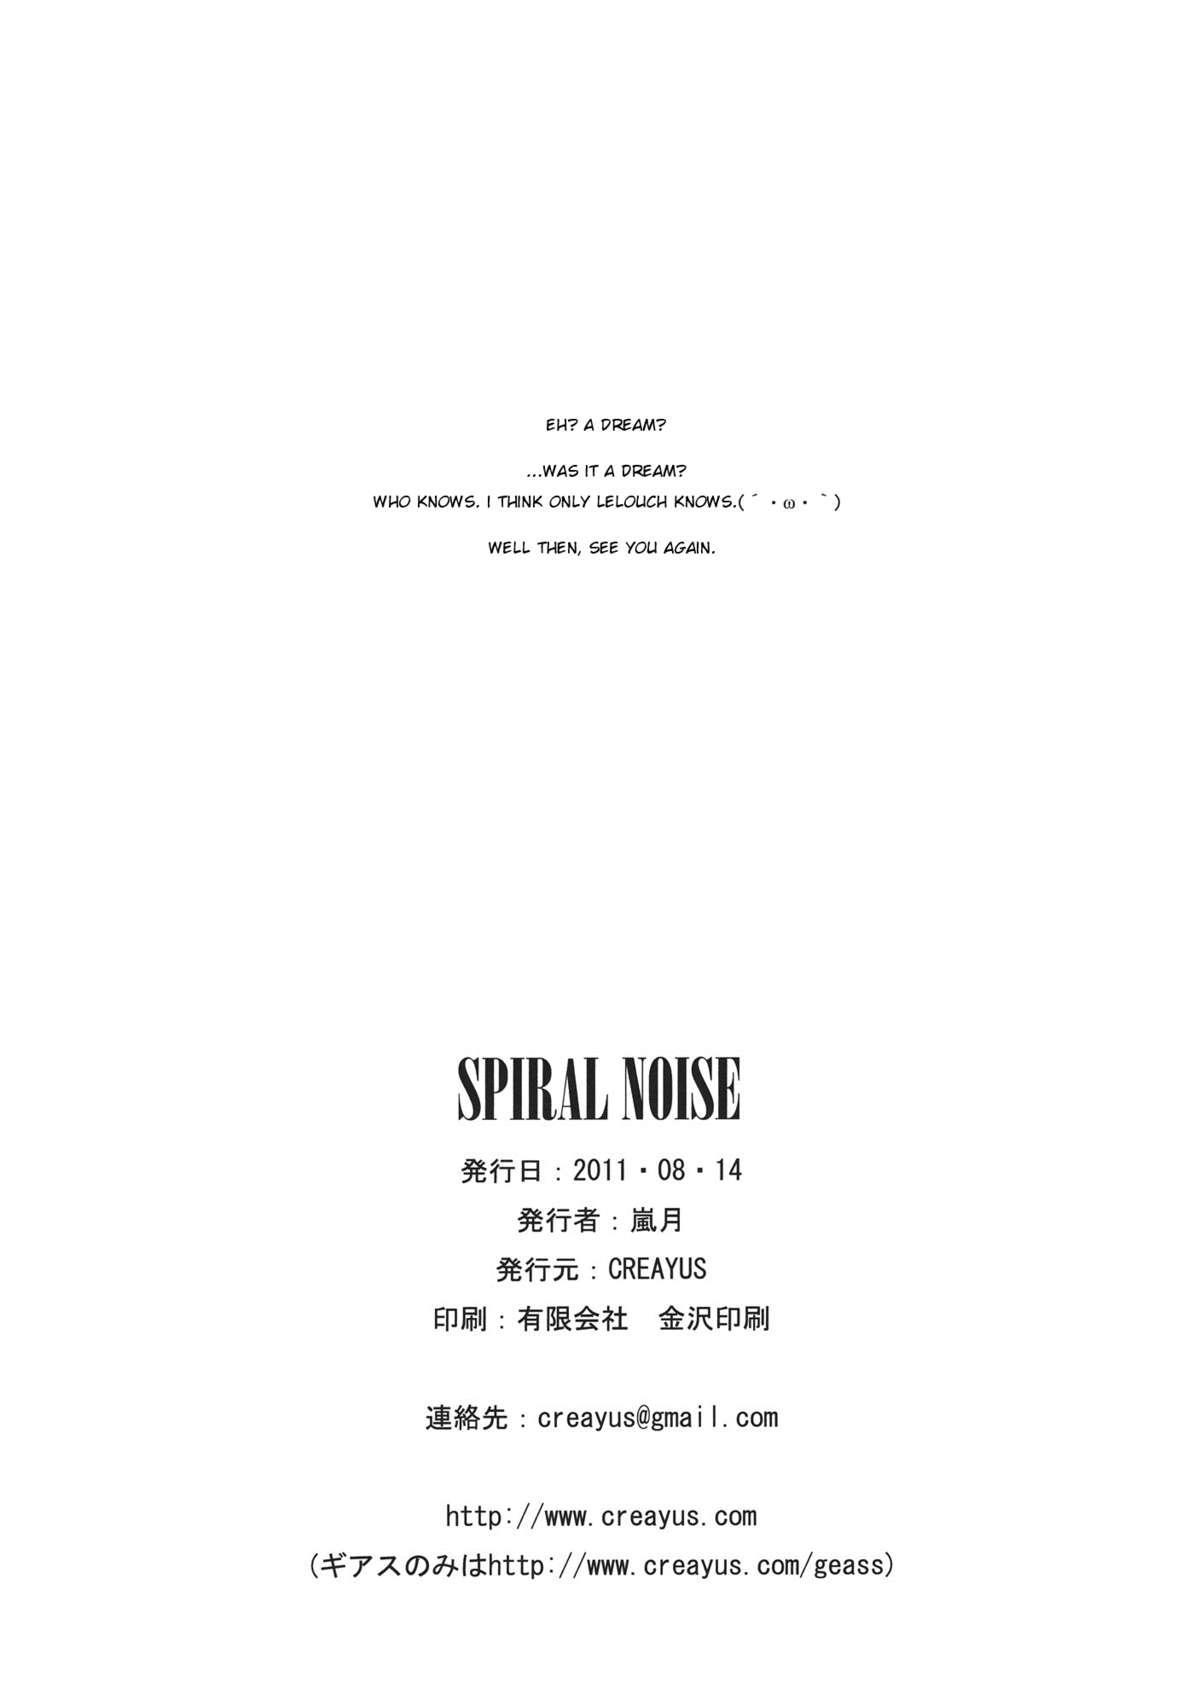 SPIRAL NOISE 33